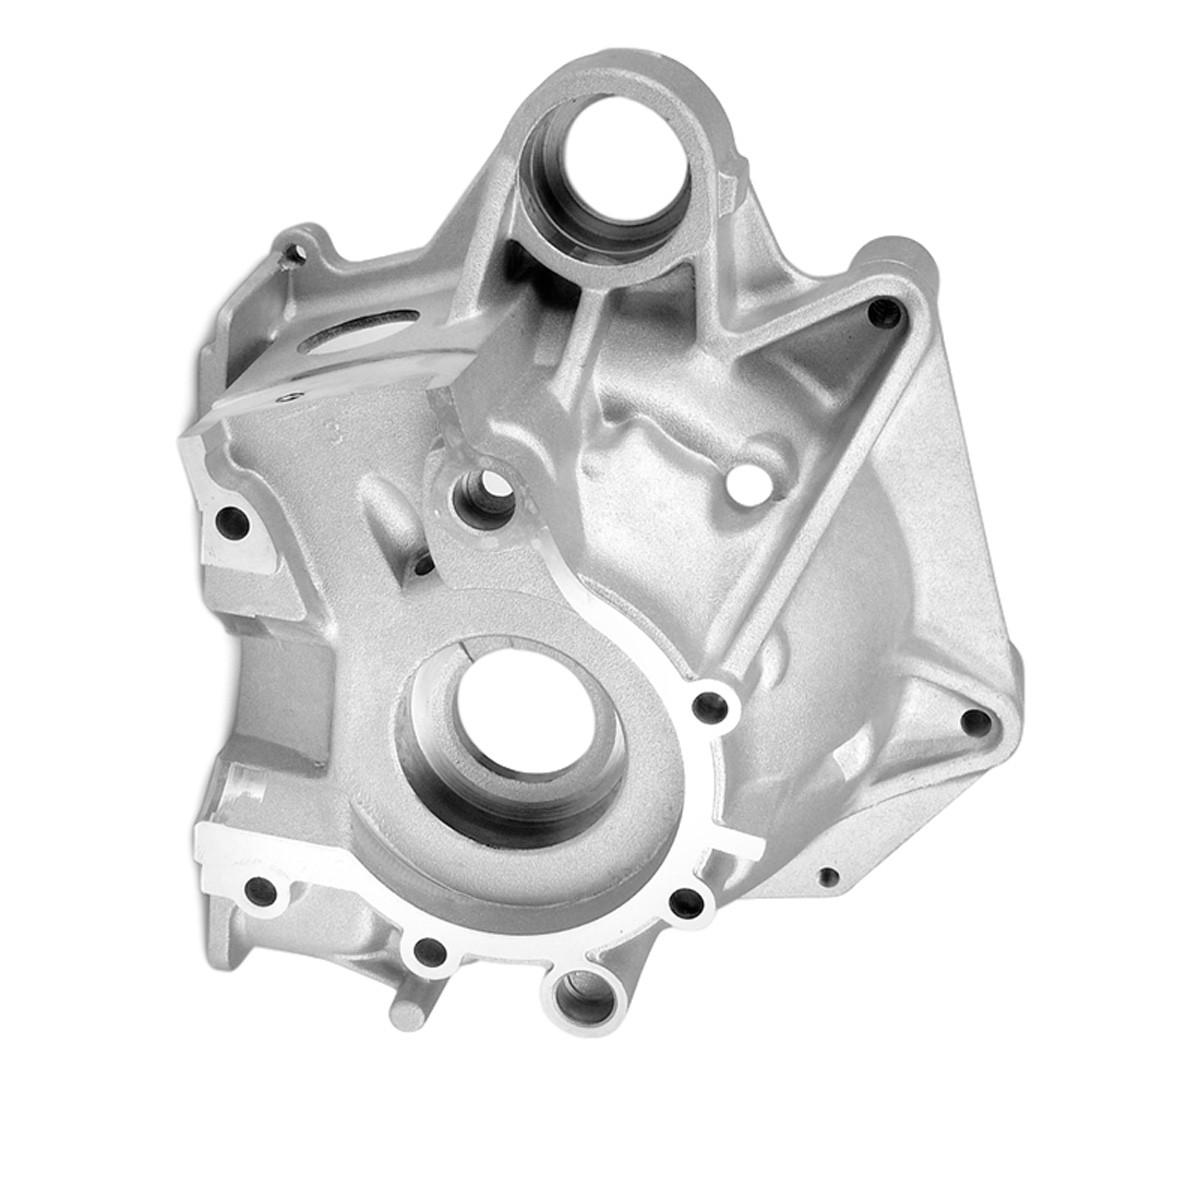 Pochette complète joints moteur MBK Nitro Ovetto Mach G  YAMAHA Aerox Neos Jog